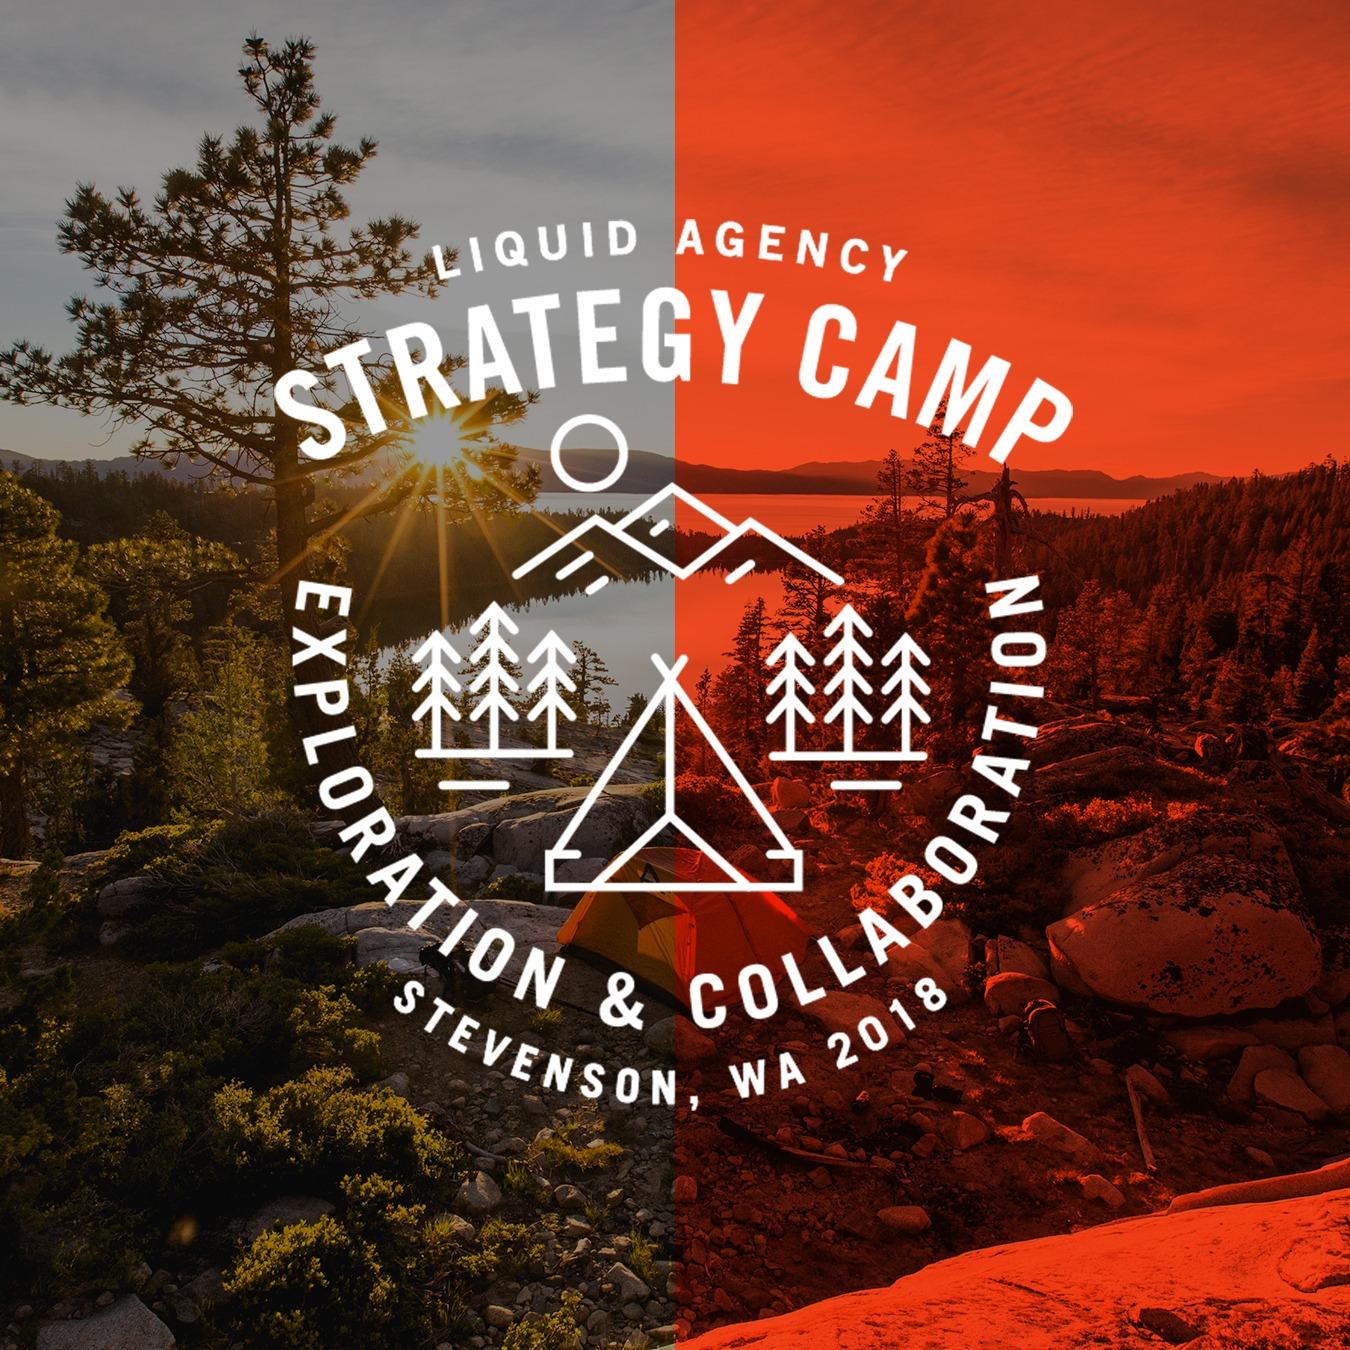 liquid agency strategy camp